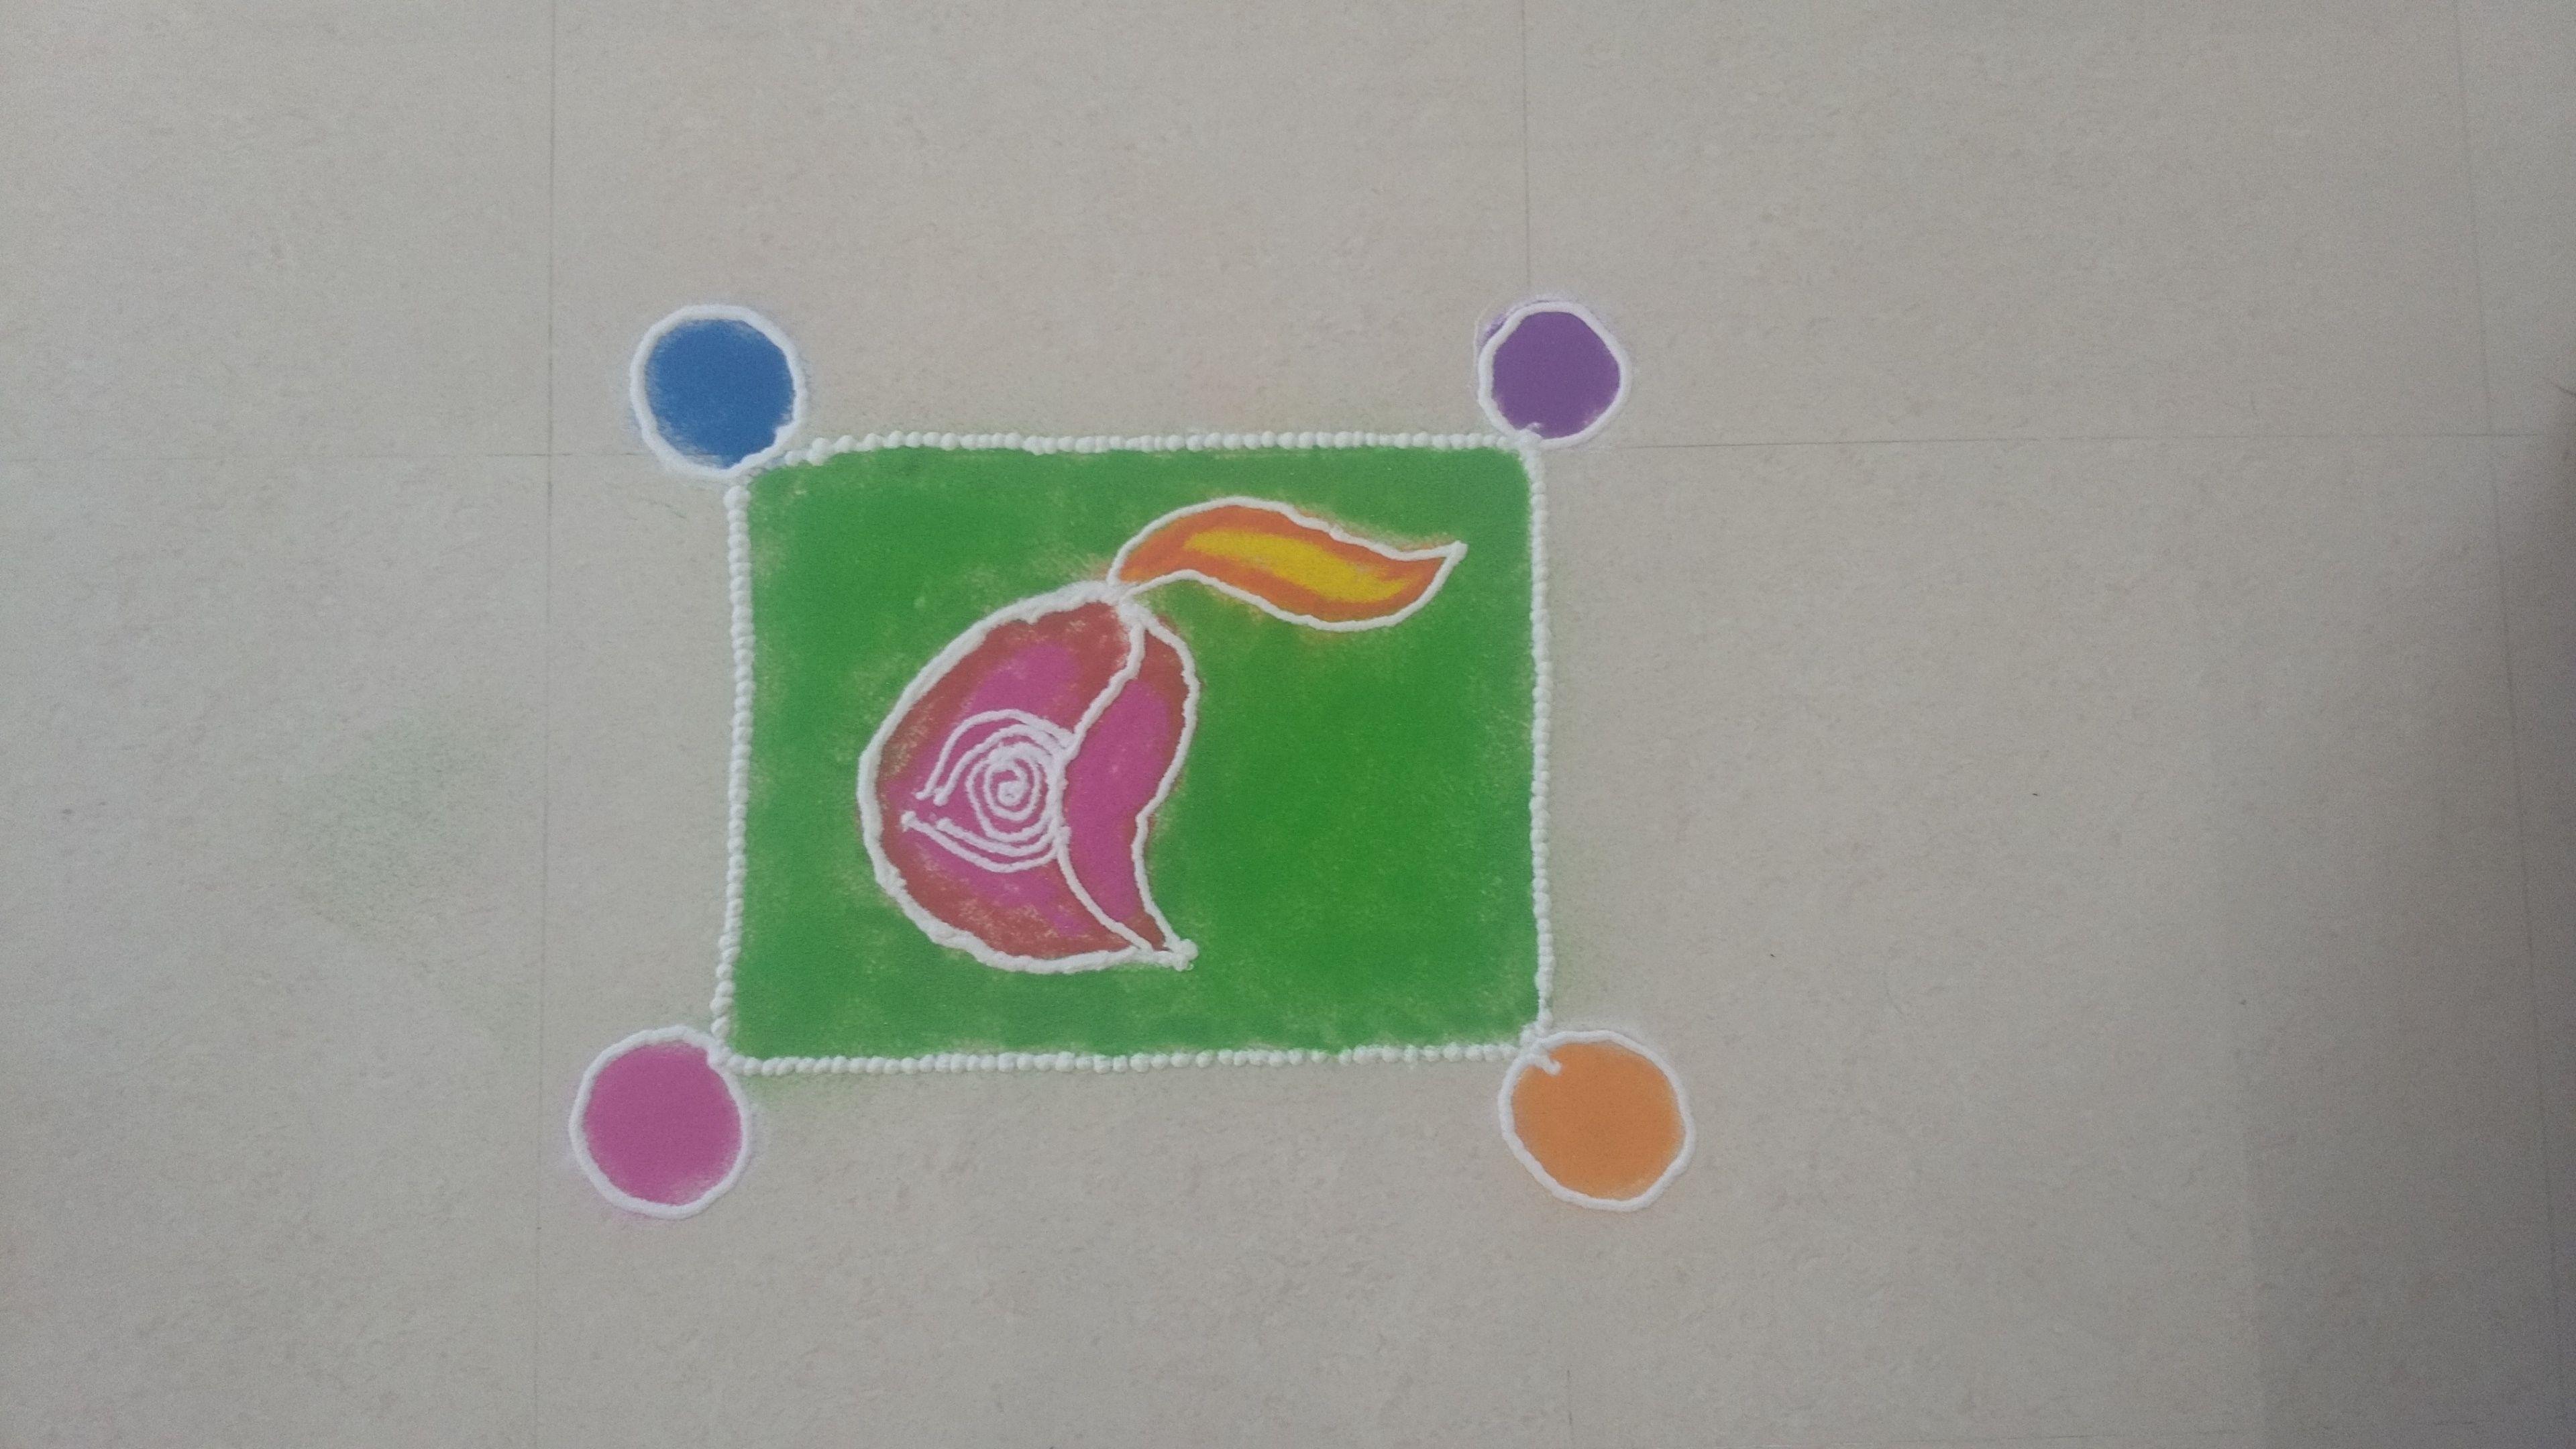 Diwali Beautiful New Rangoli Designs/ इस दिवाली पर बनाये Happy Diwali Colourful Rangoli Designs - #rangolidesignsdiwali इस दिवाली पर बनाये सरल और आसान रंगोली - Diwali Celebrations || Diwali Latest Rangoli Designs | diwali rangoli desgins | Beautiful Rangoli Design | Rangoli Easy and Beautiful Designs for Diwali - #rangolidesignsdiwali